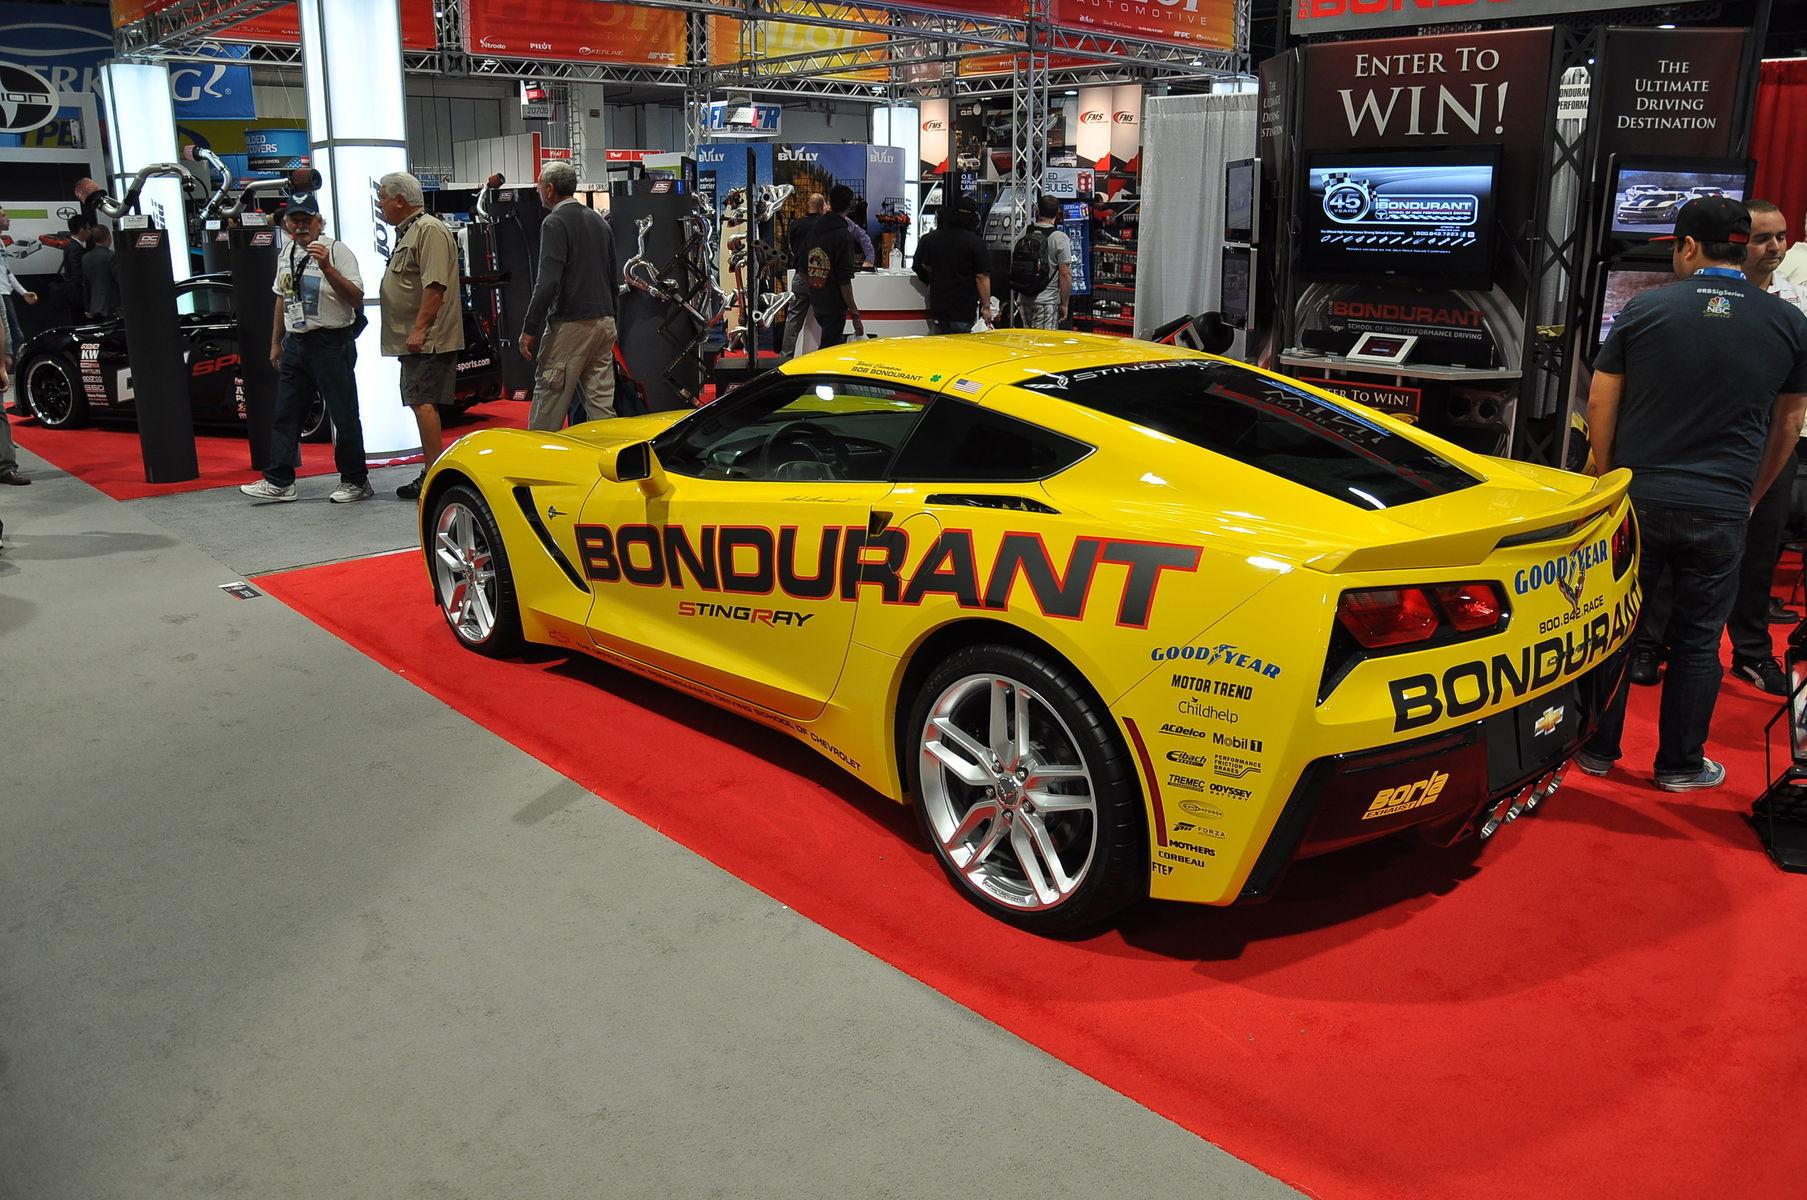 2014 Chevrolet Corvette Stingray | '14 C7 Corvette Stingray in Bondurant booth @ SEMA '13